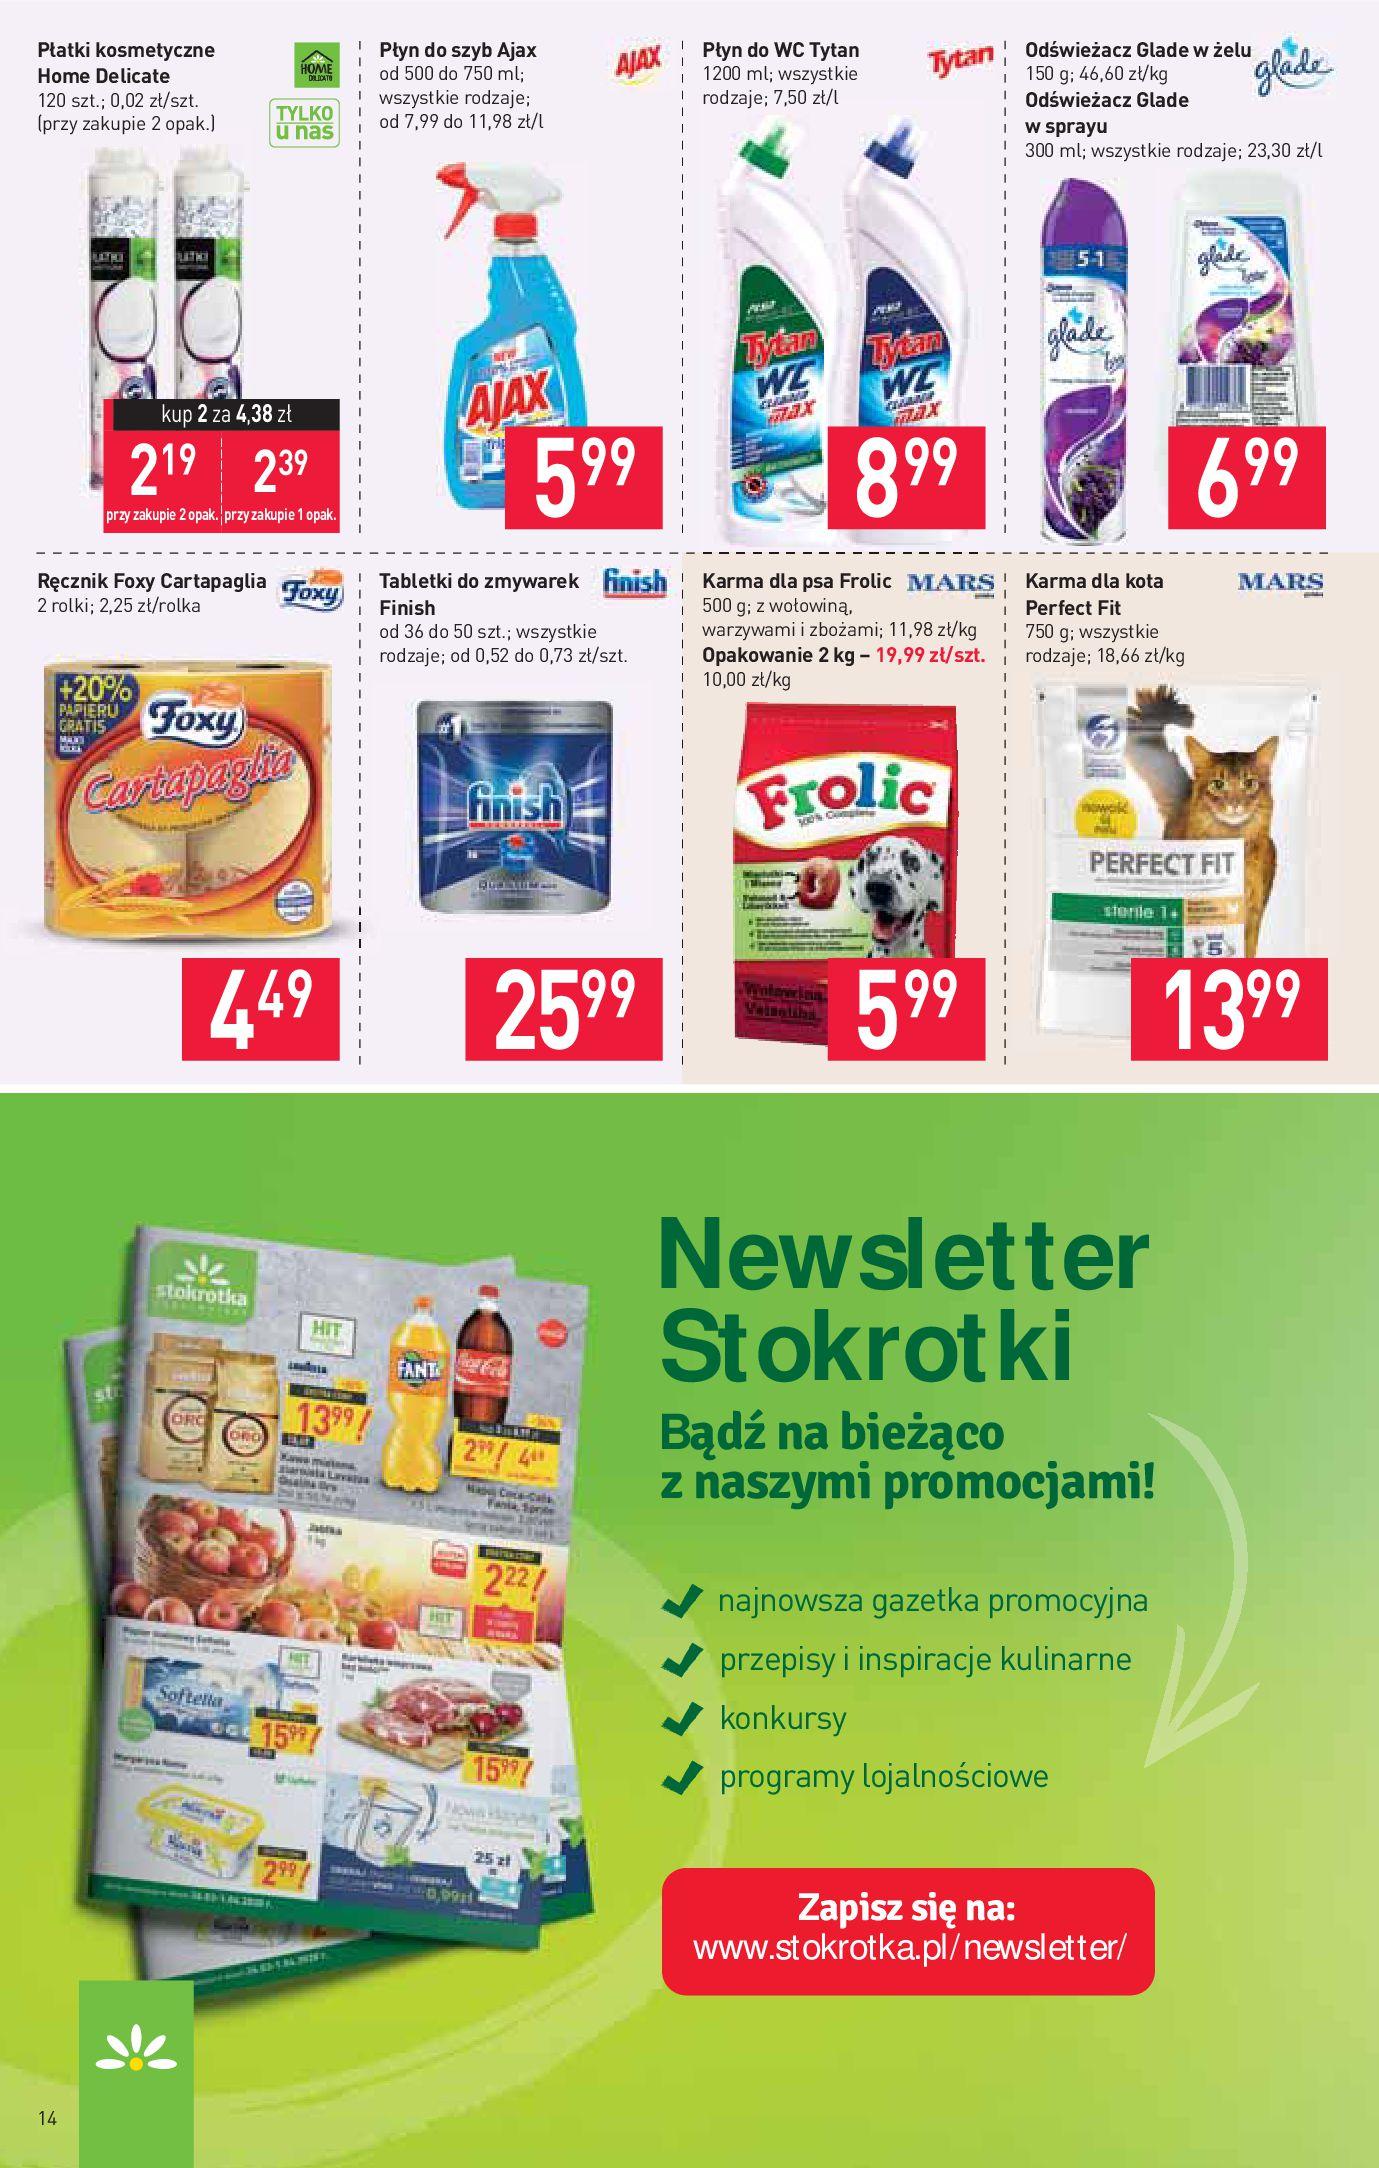 Gazetka Stokrotka Supermarket - Oferta handlowa-23.03.2020-02.04.2020-page-14